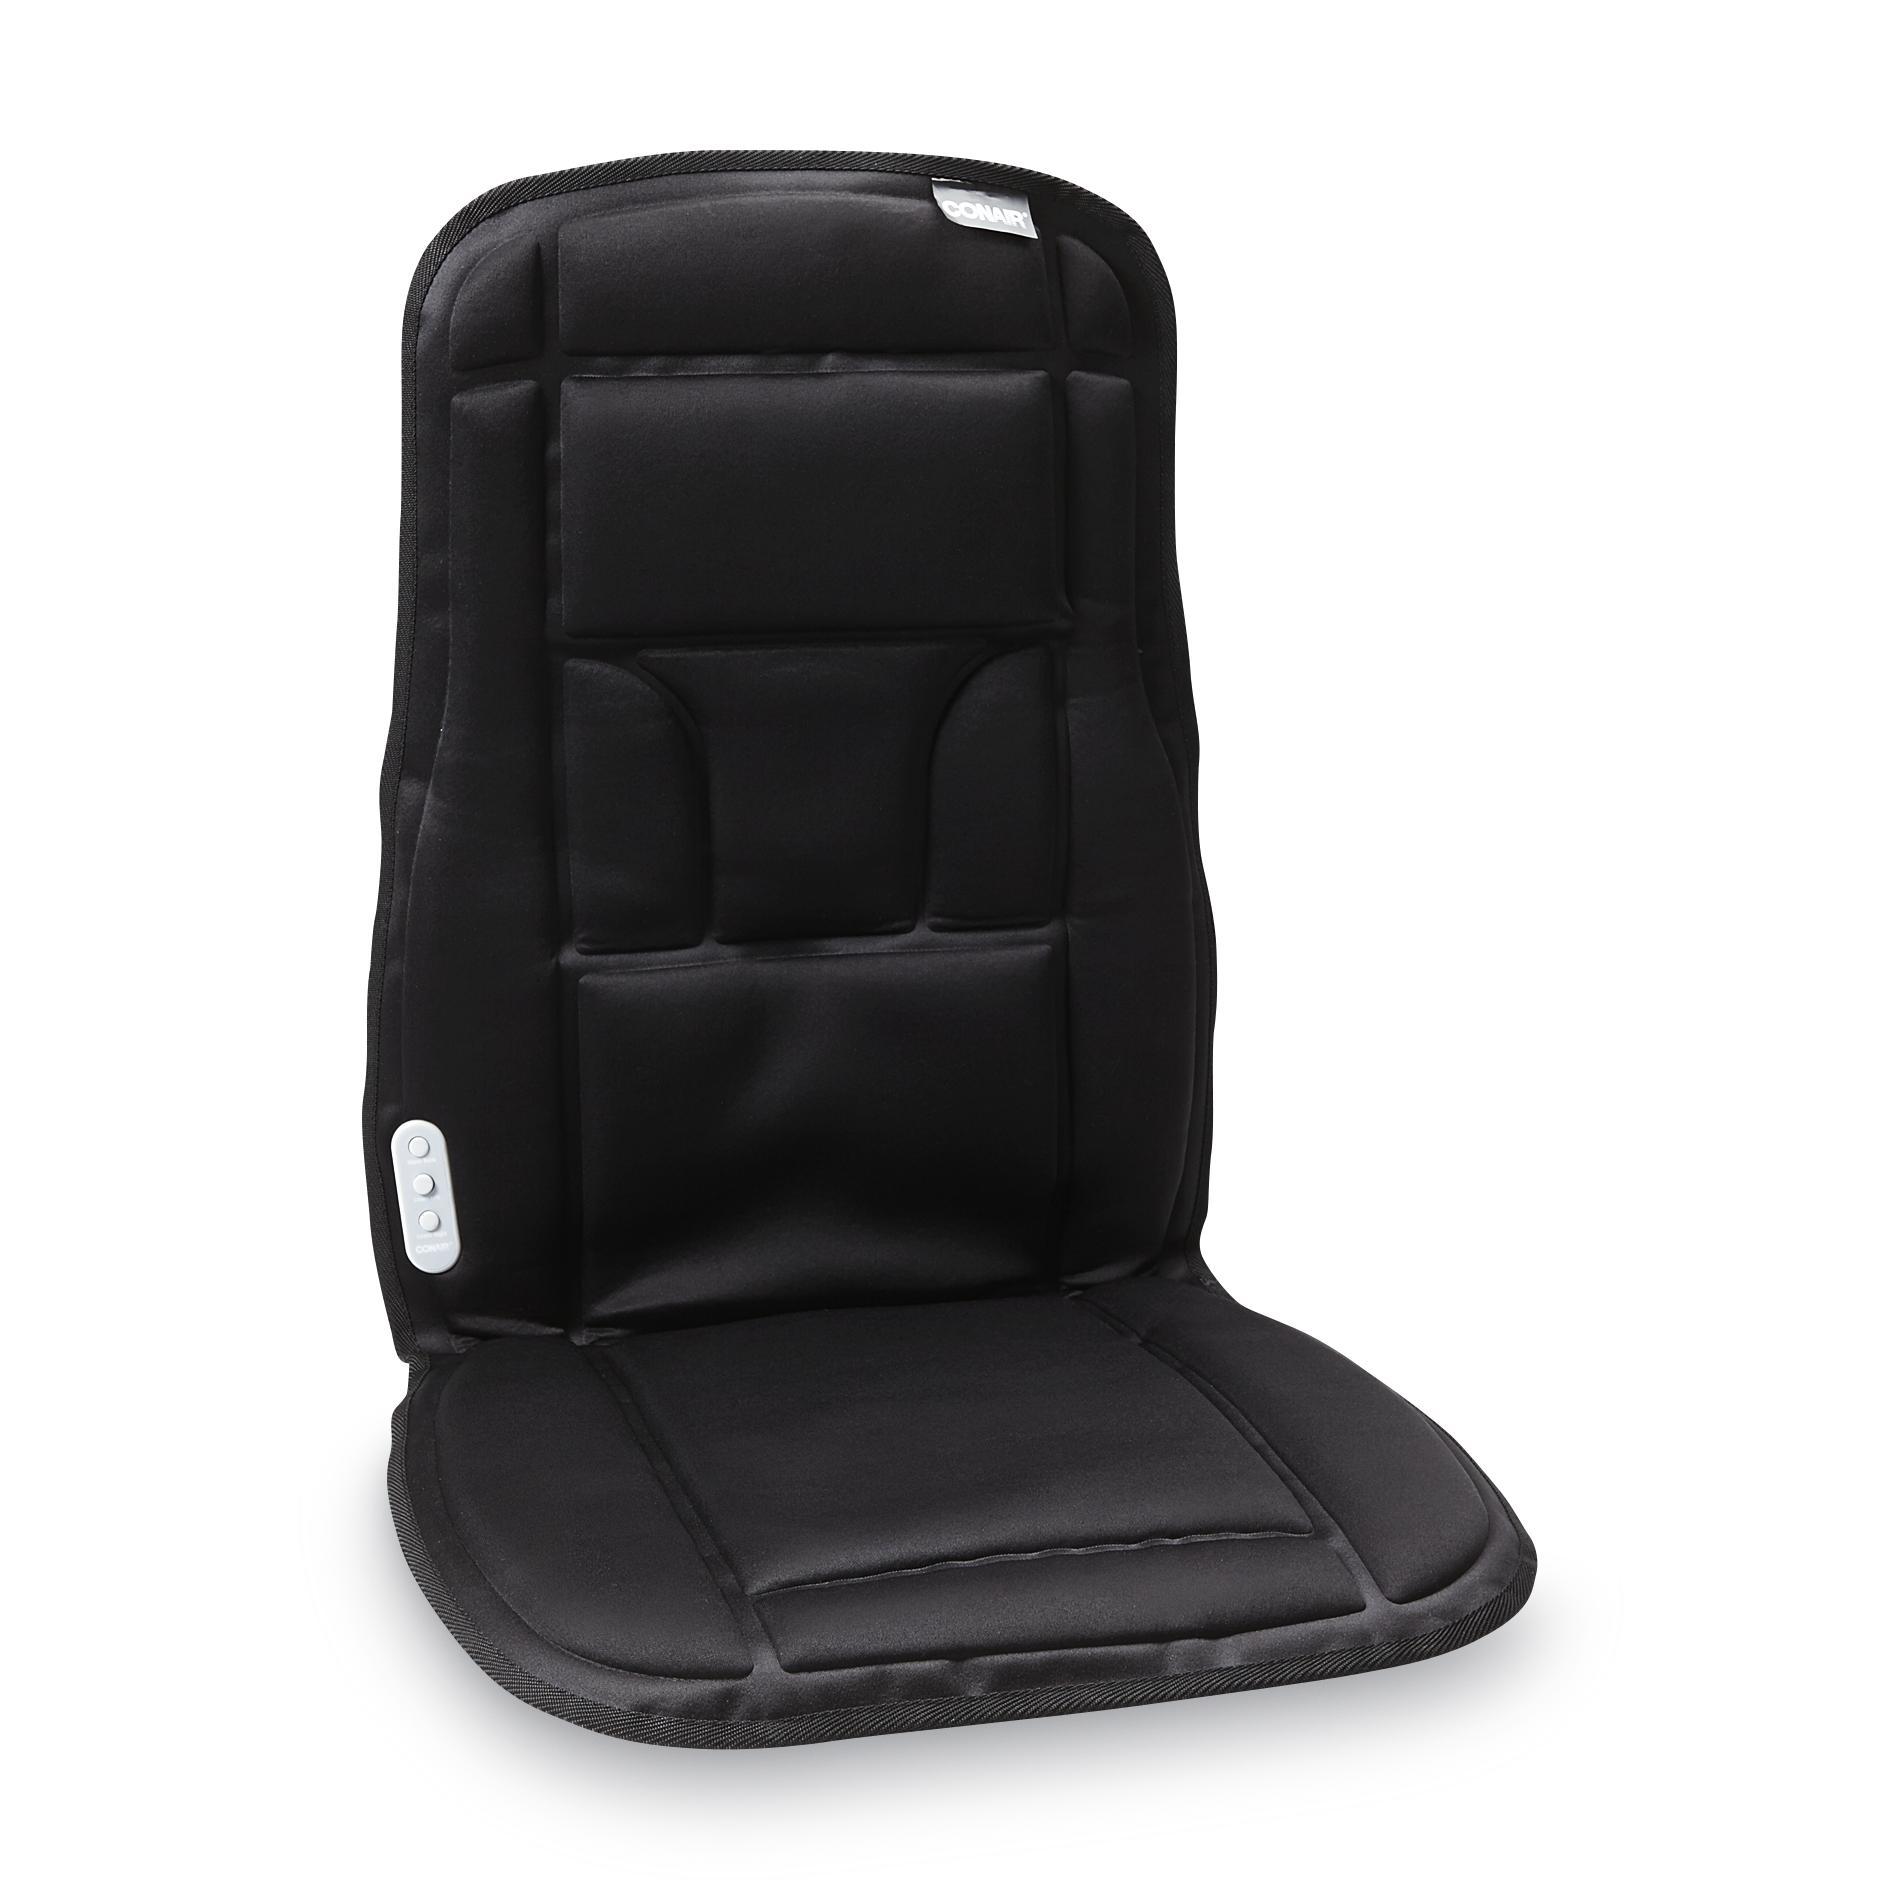 Conair Heated Massaging Seat Cushion 1 Pc